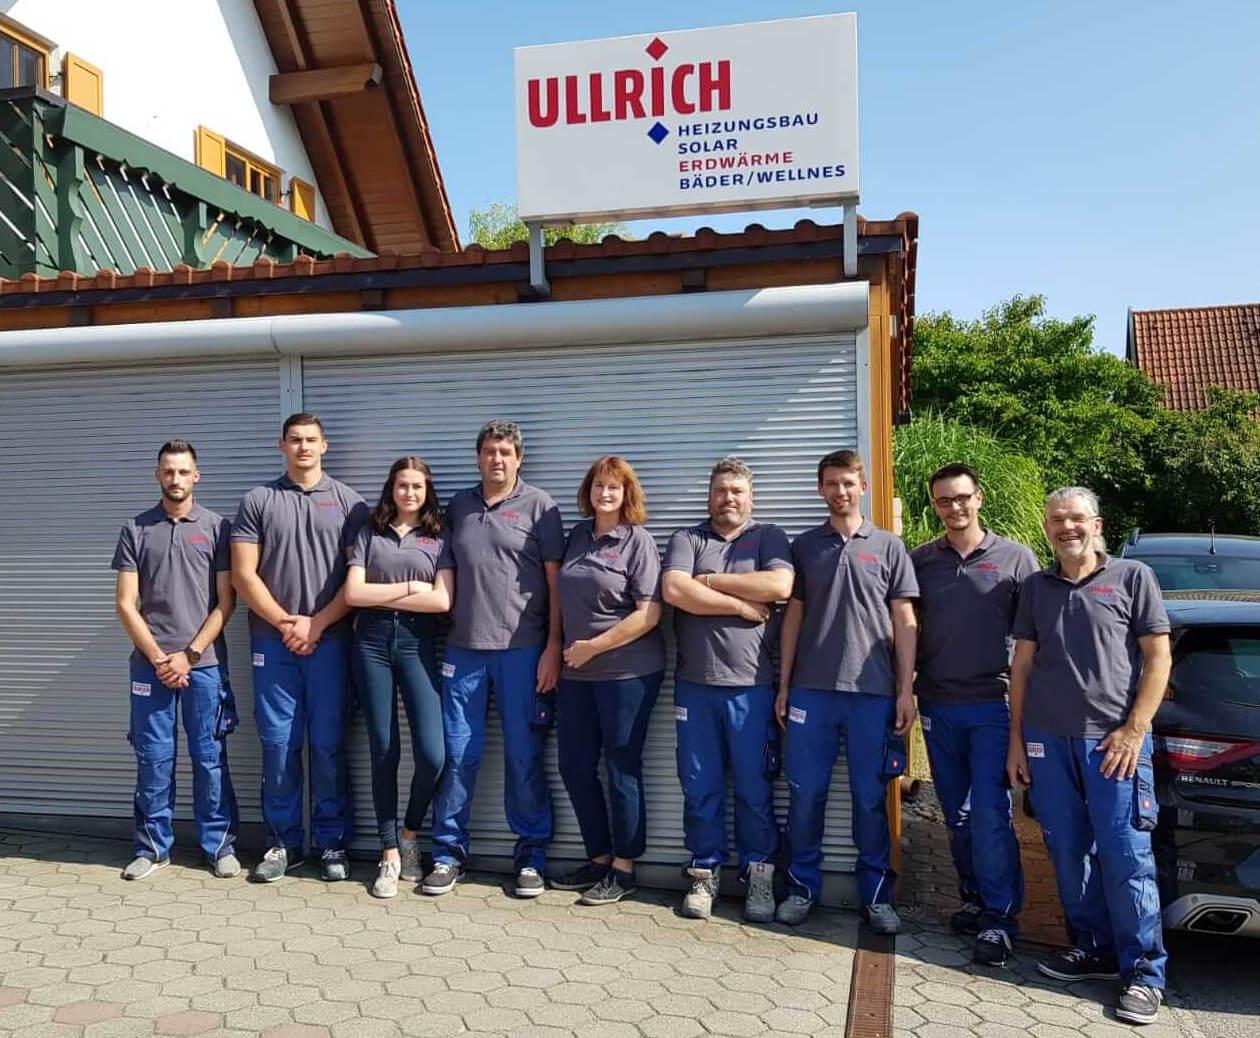 Ullrich Heizungsbau Pflaumdorf - Team